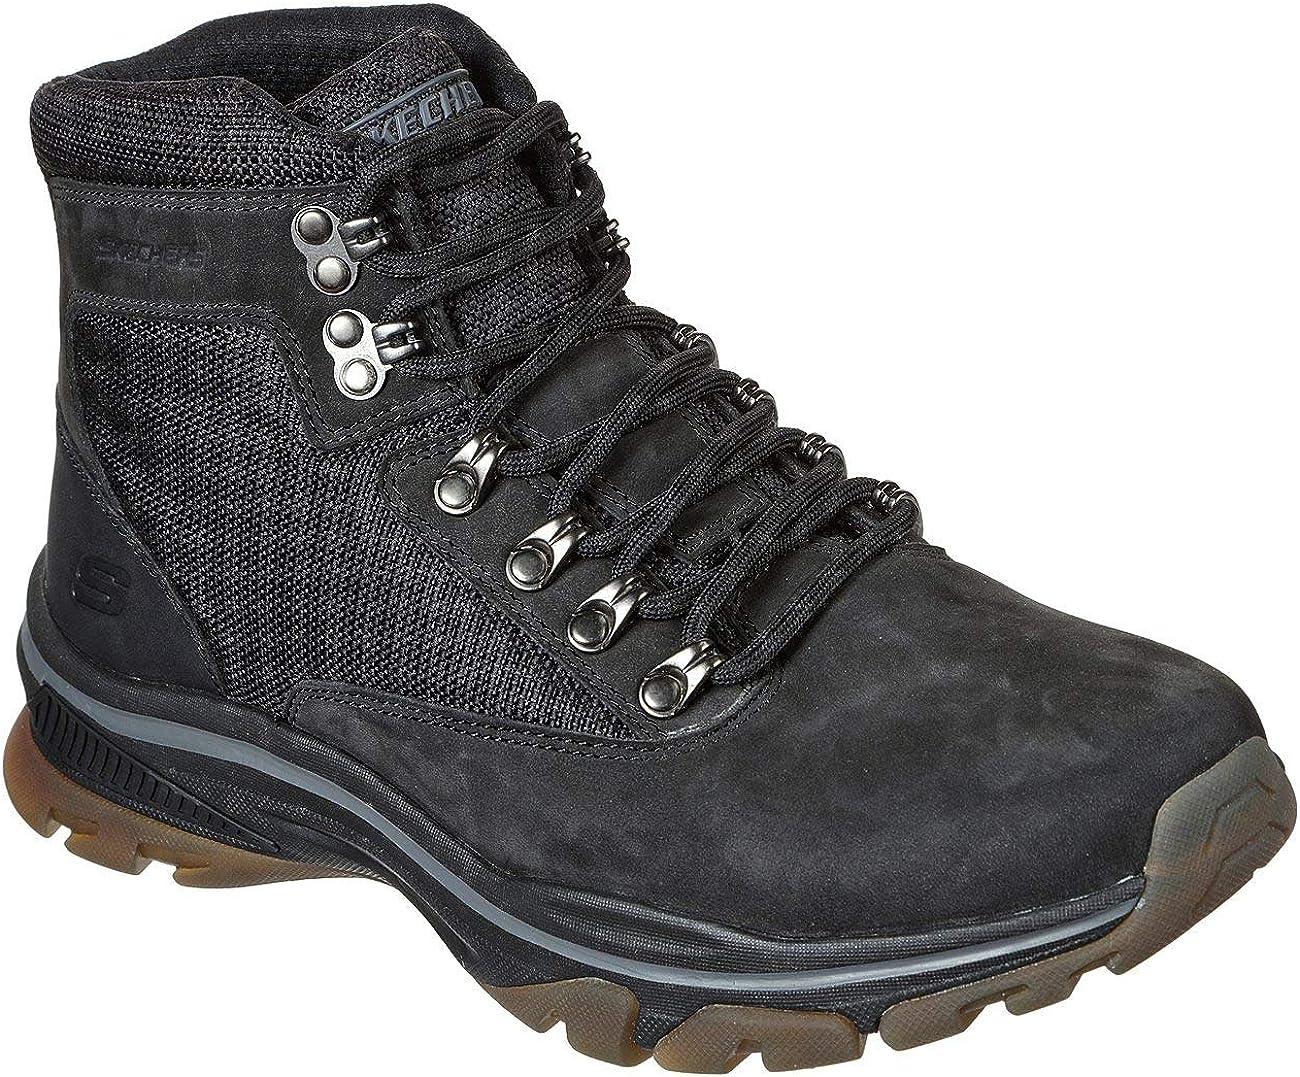 Skechers USA Men's Hiking Boot | Shoes